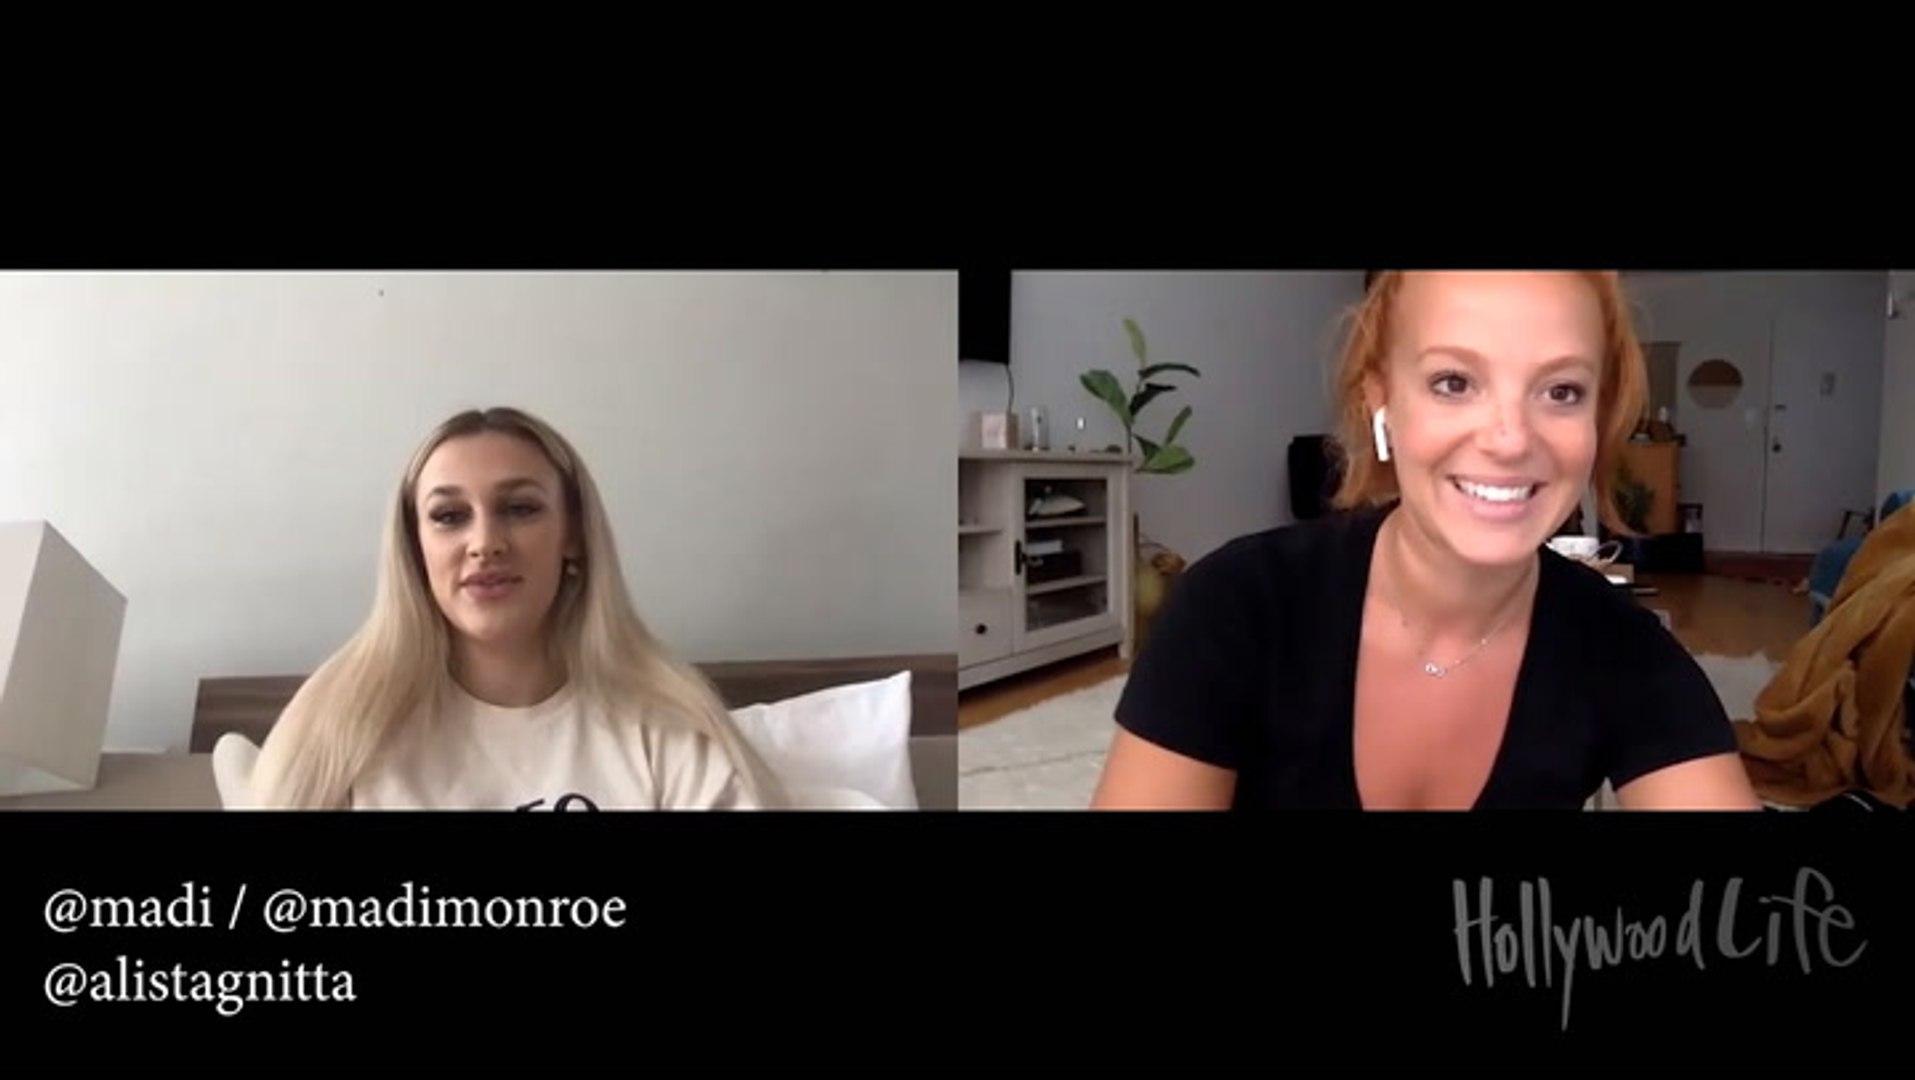 Madi Monroe Speaks On New Reality Show, TikTok Ban, & Avani and Charli D'amelio Friendship